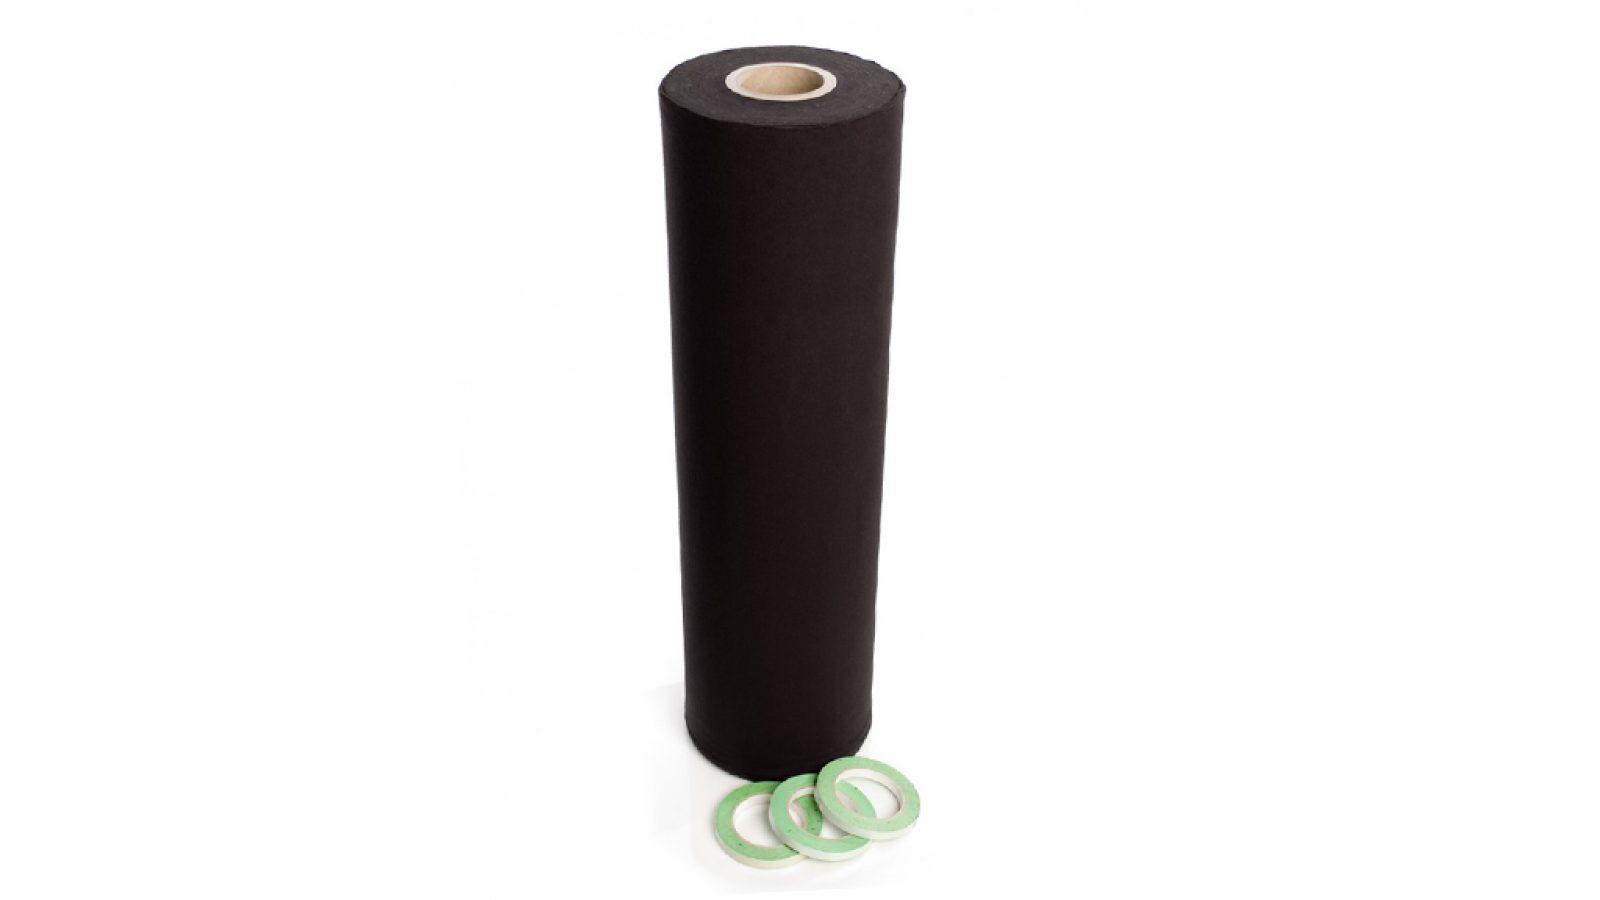 verhuur-slider-accessoires-4